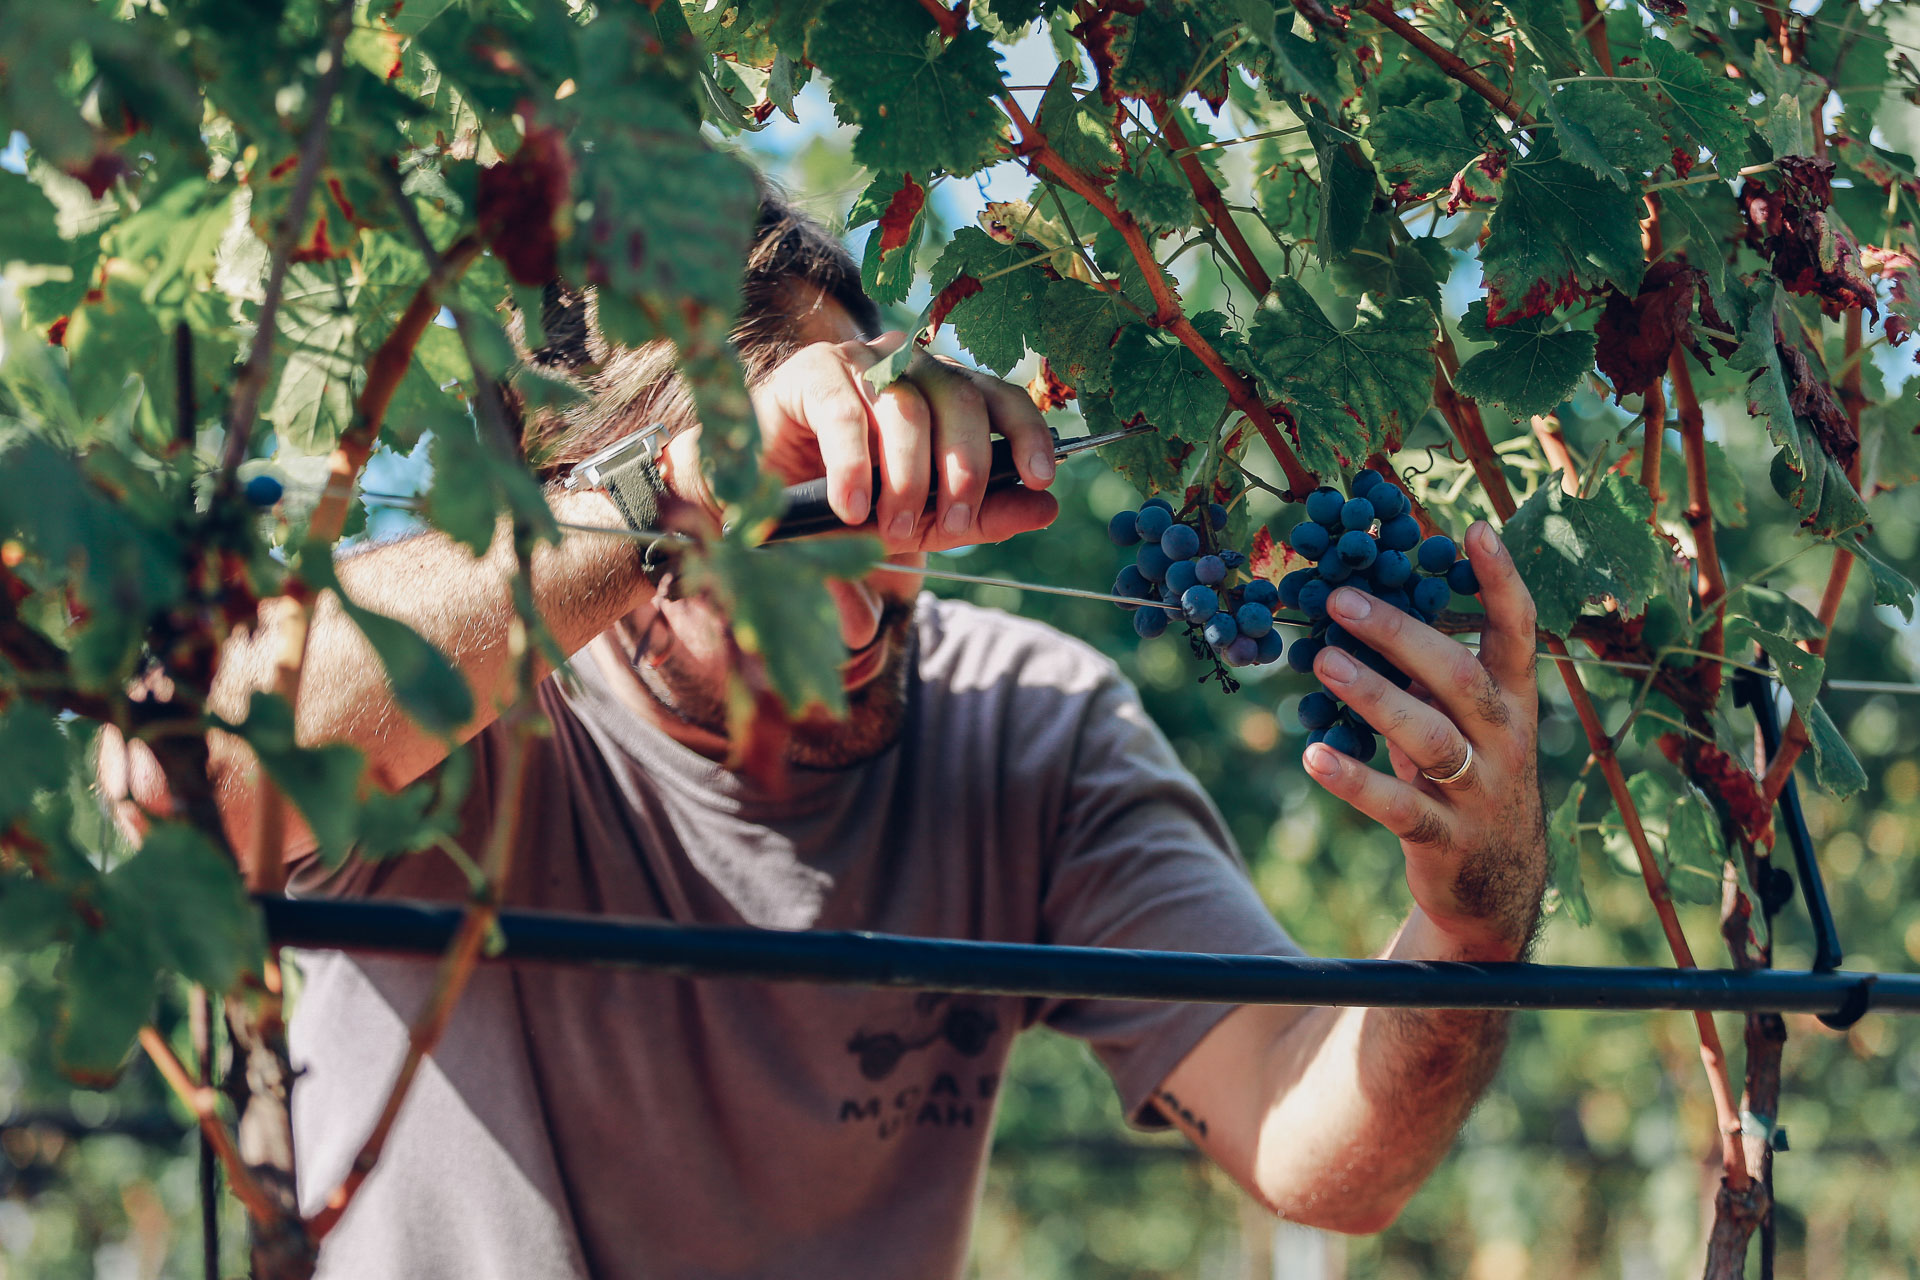 002-Sauro-maule-wineyards-organic-harvest-2016-_RUI7291_p_Lr_web_HD